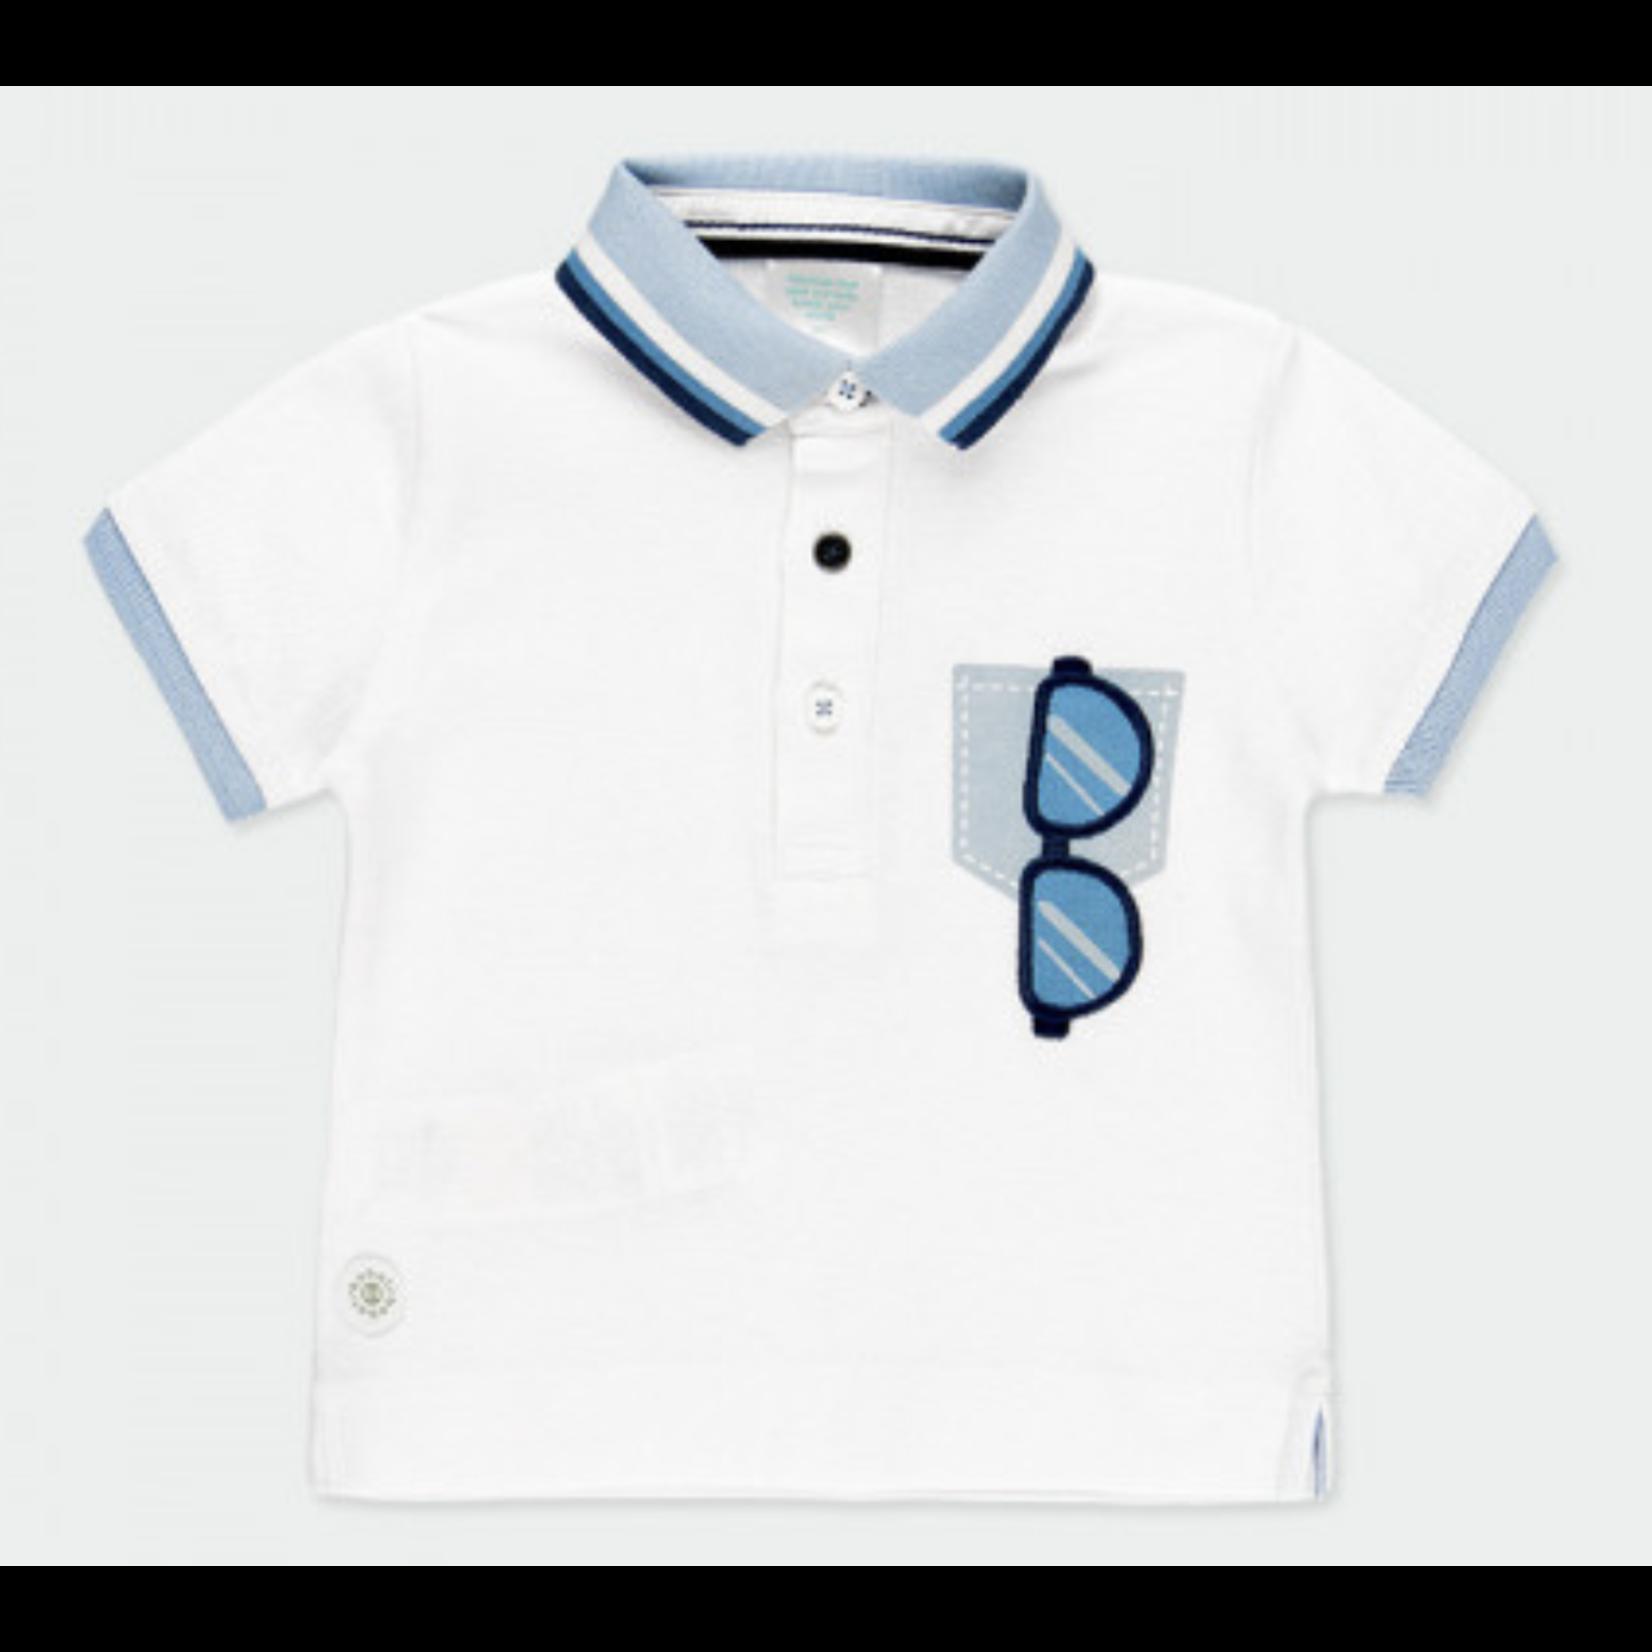 Bóboli Pique polo for baby boy met bril